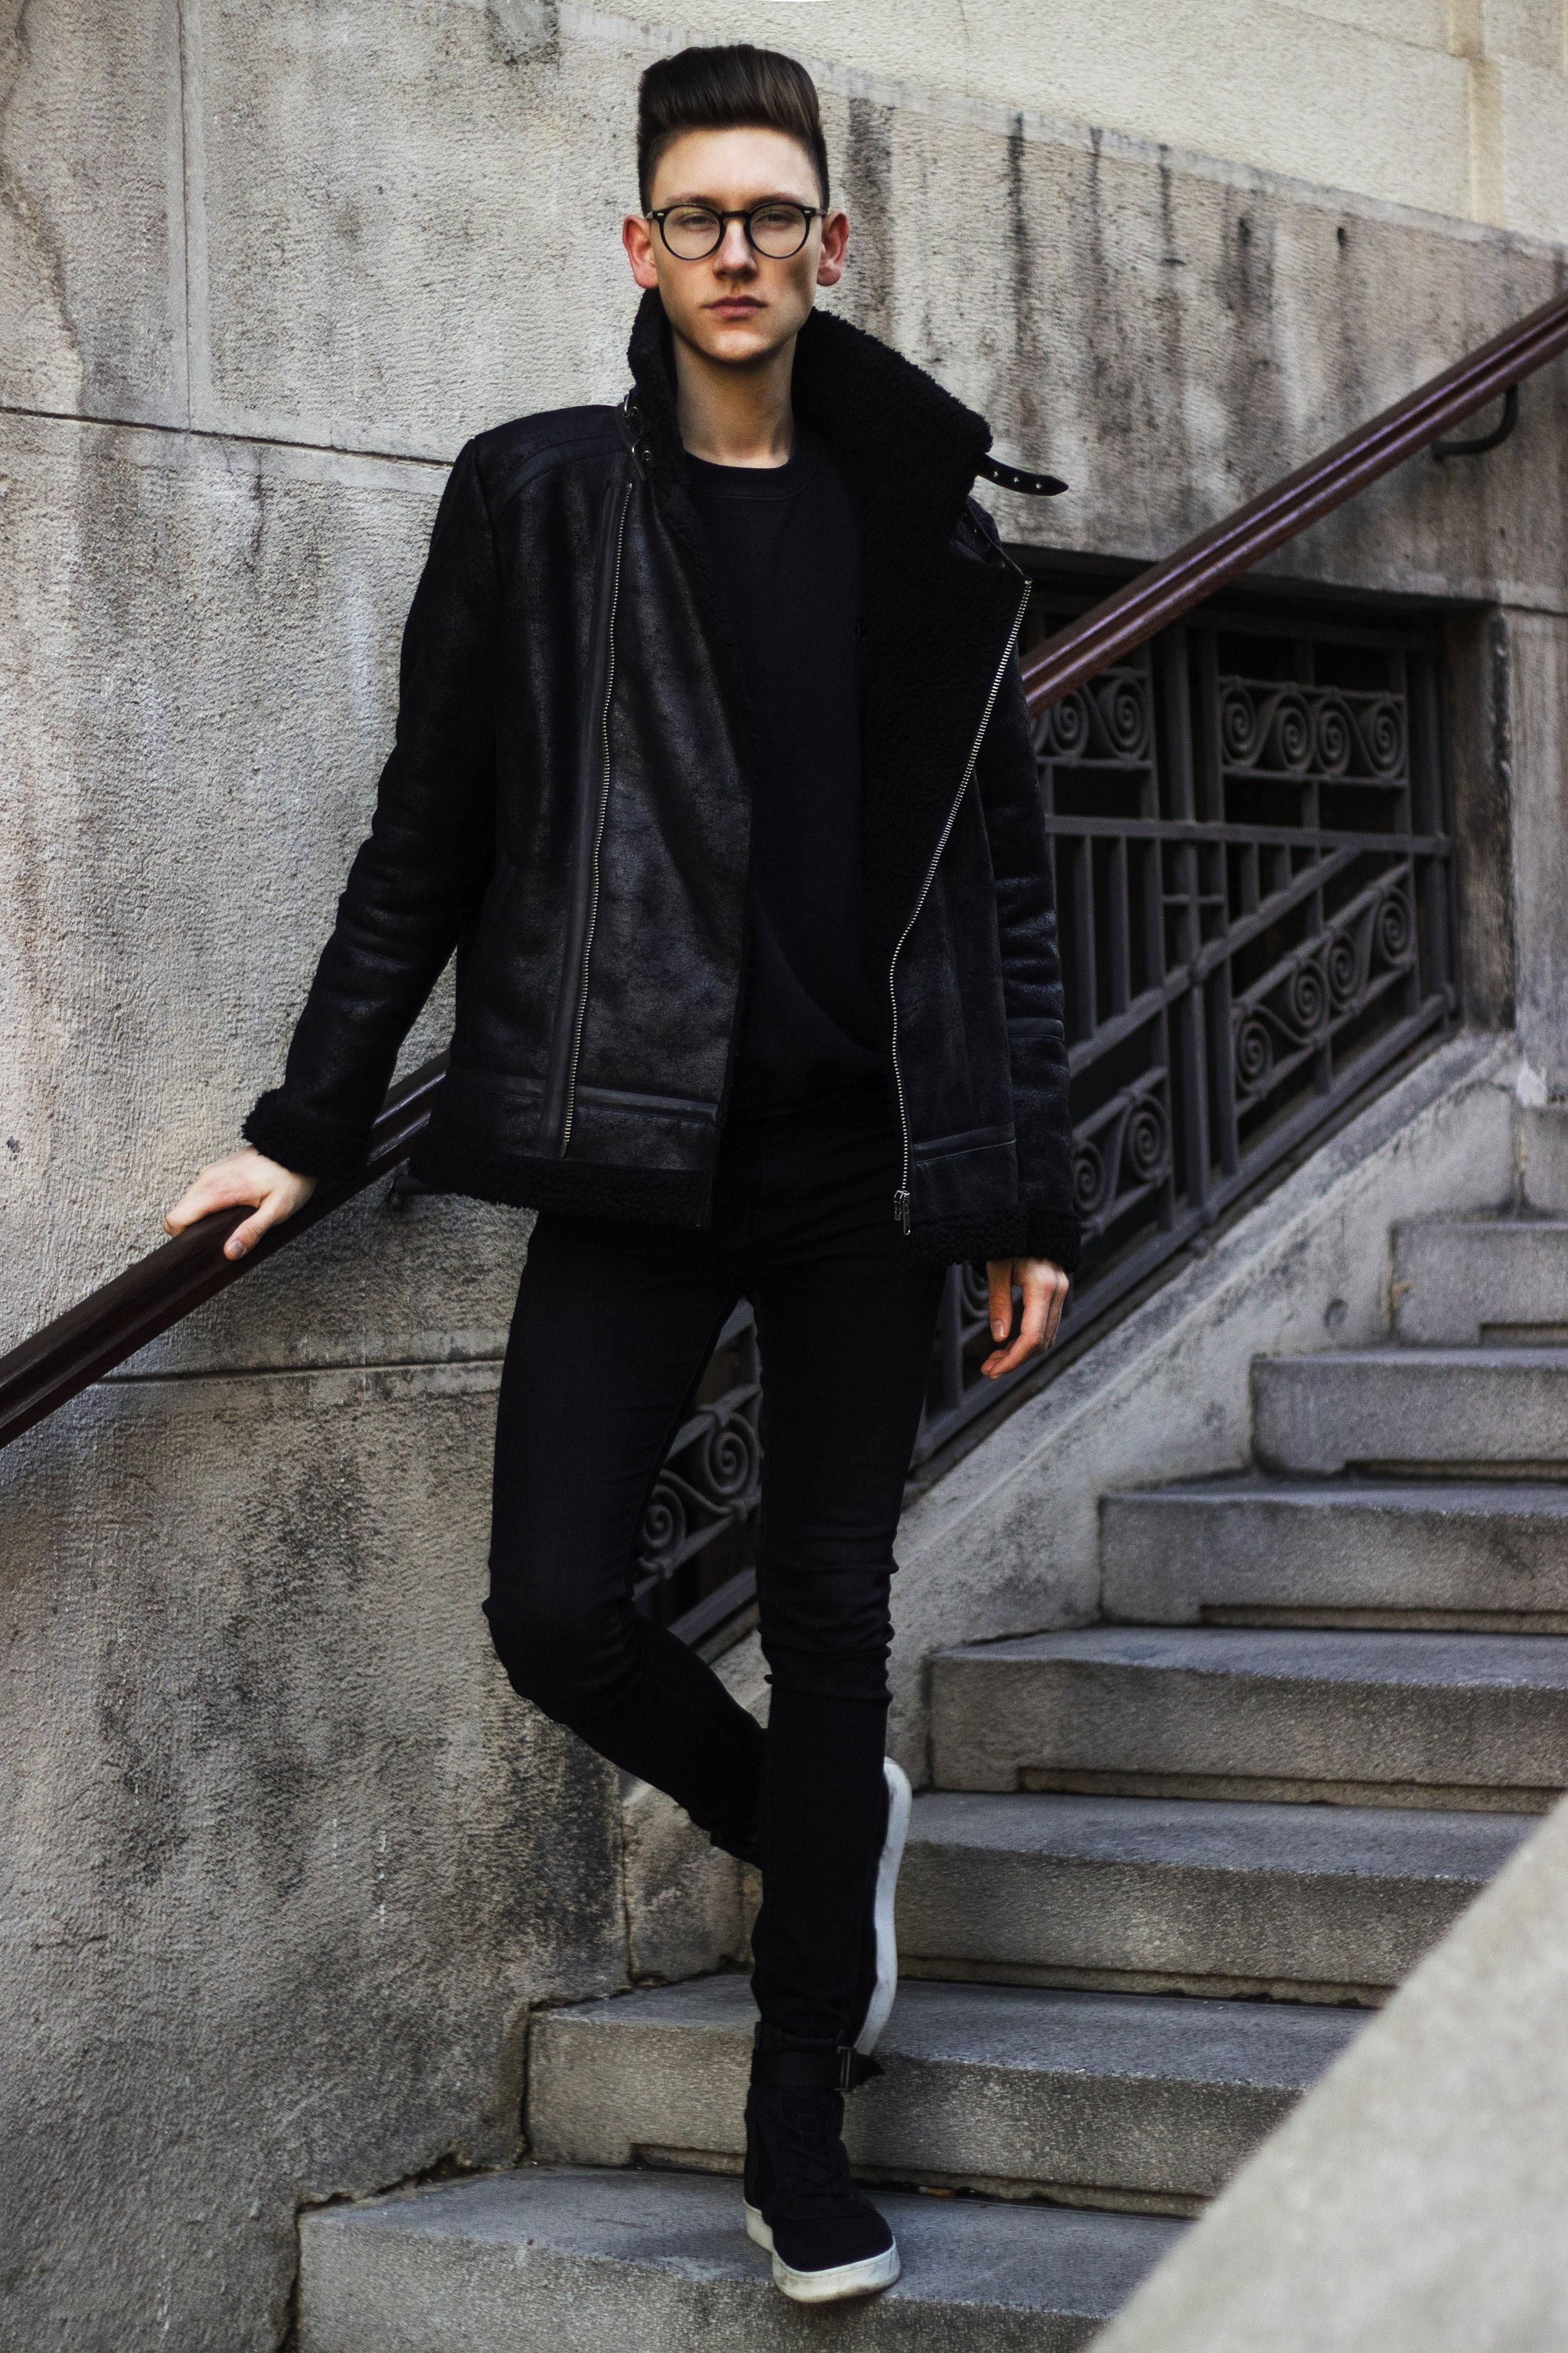 luka-lajic-expensive-reality-hm-mens-fashion-croatia-blogger (5).jpg